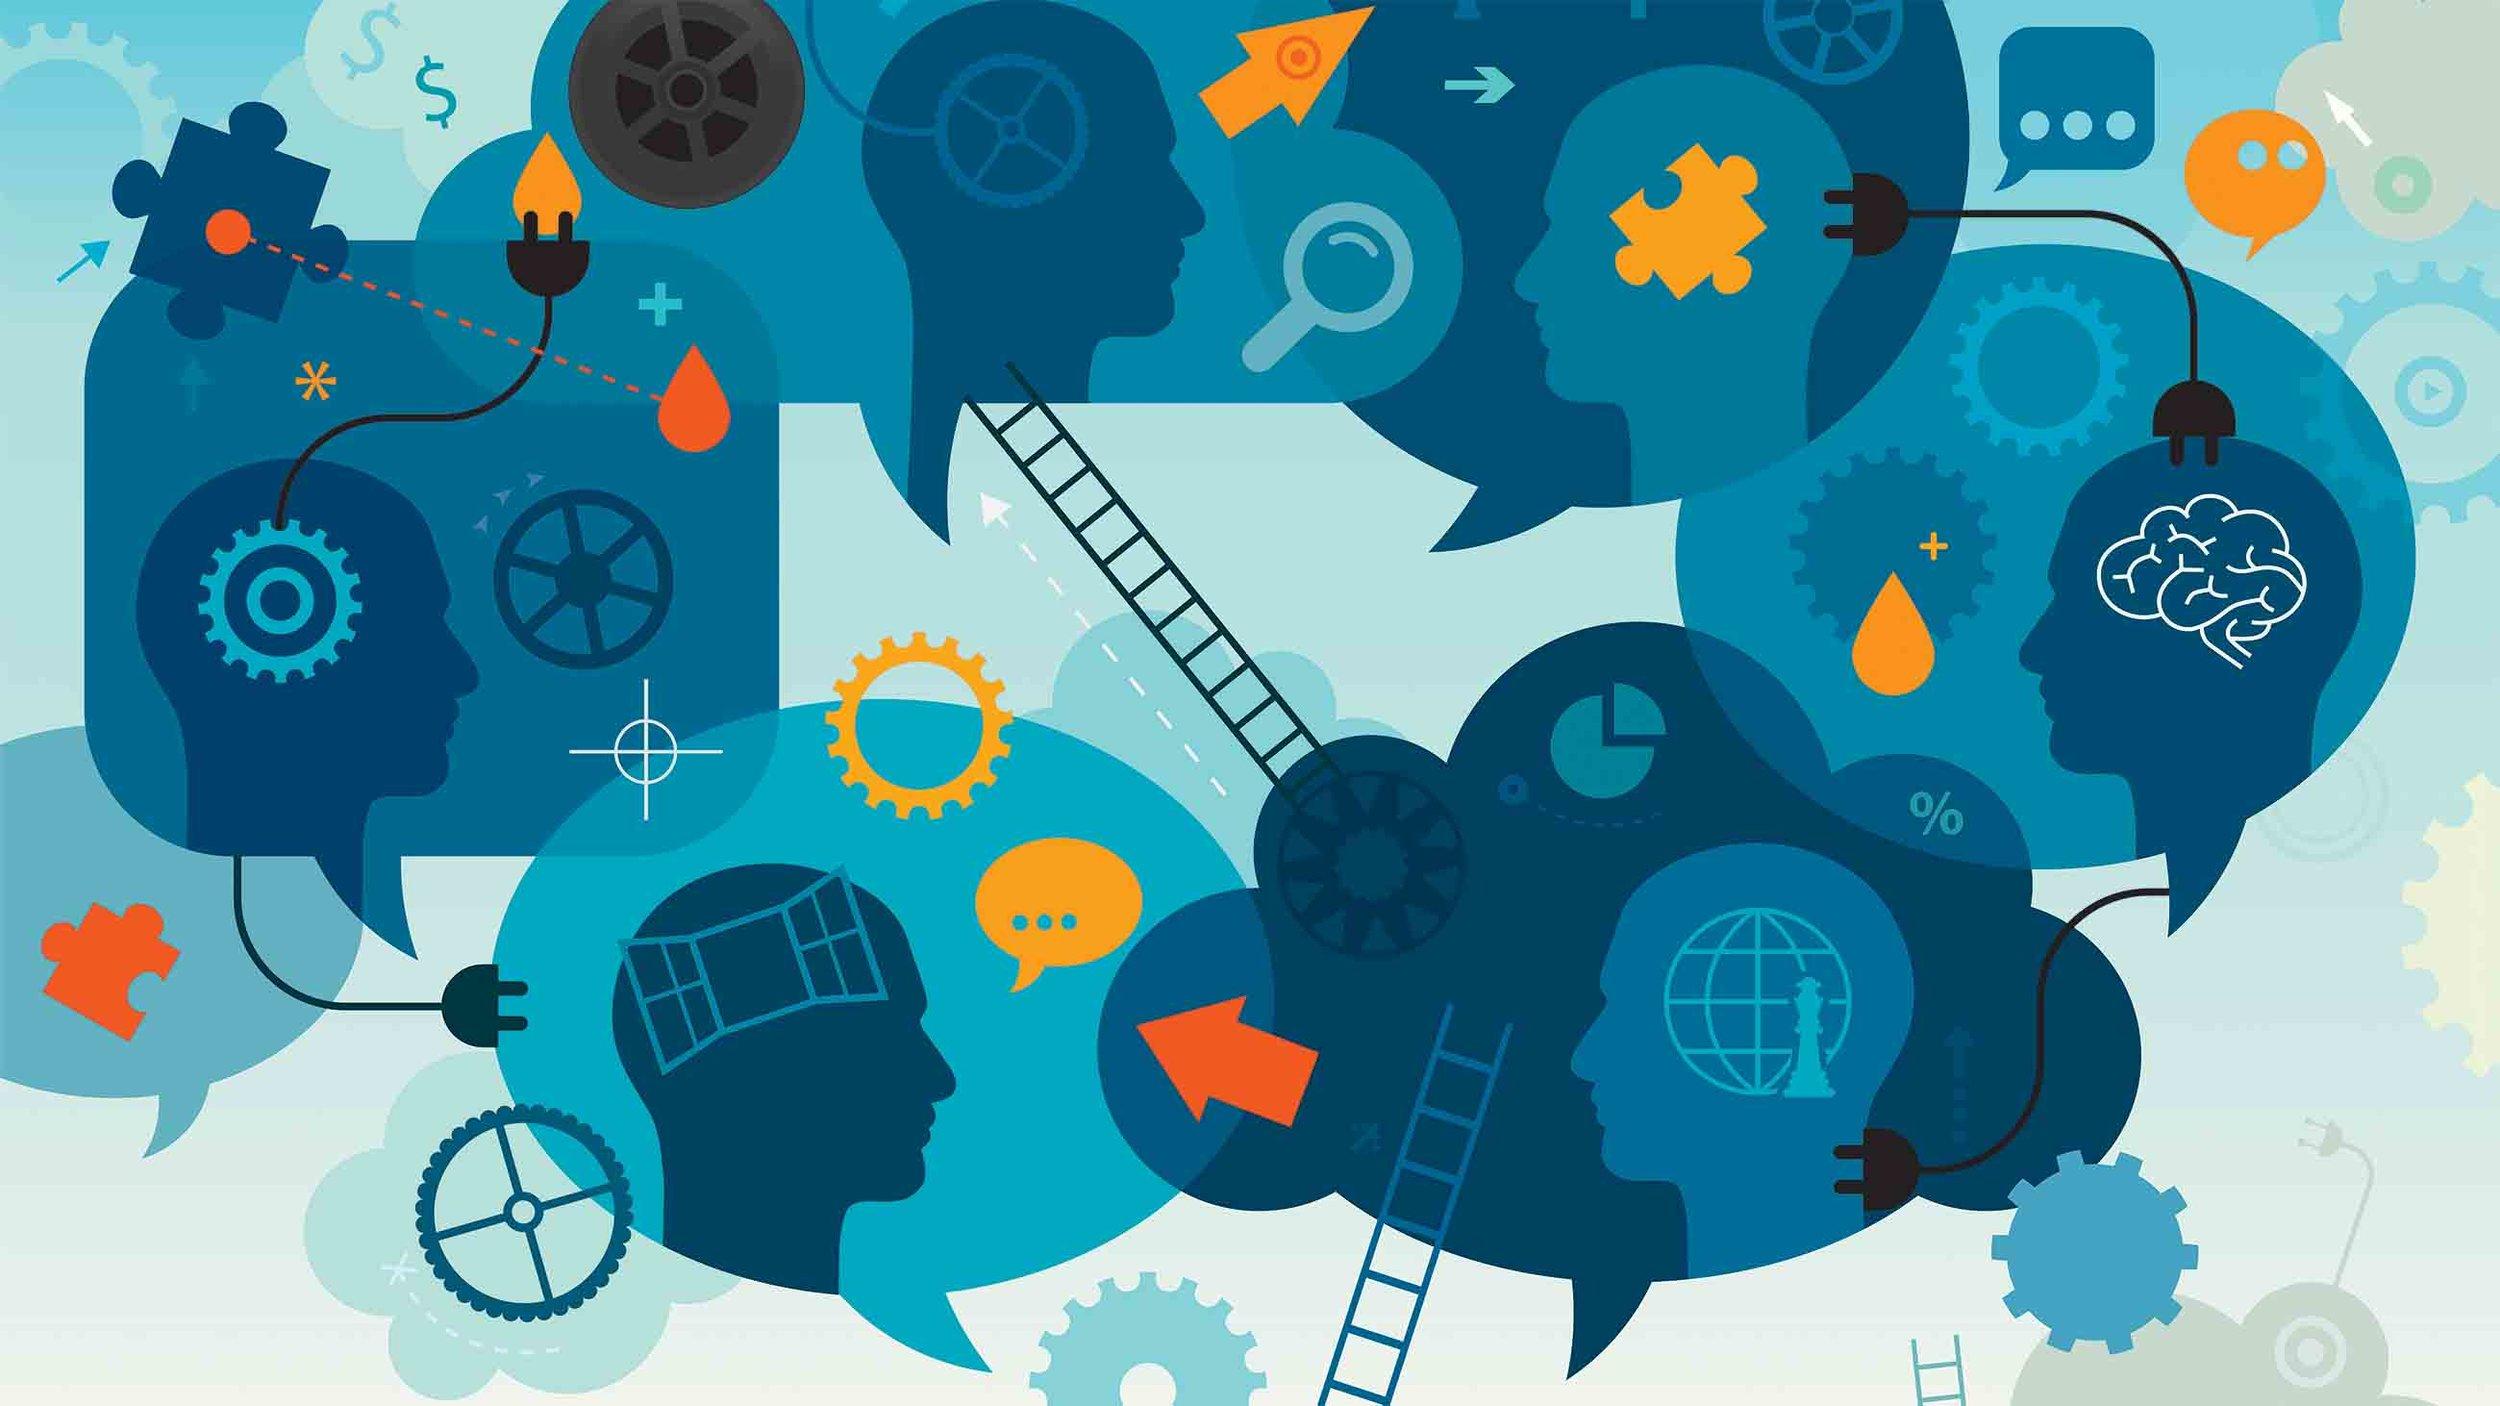 brainstorming person using scientific method to avoid scientific mistakes